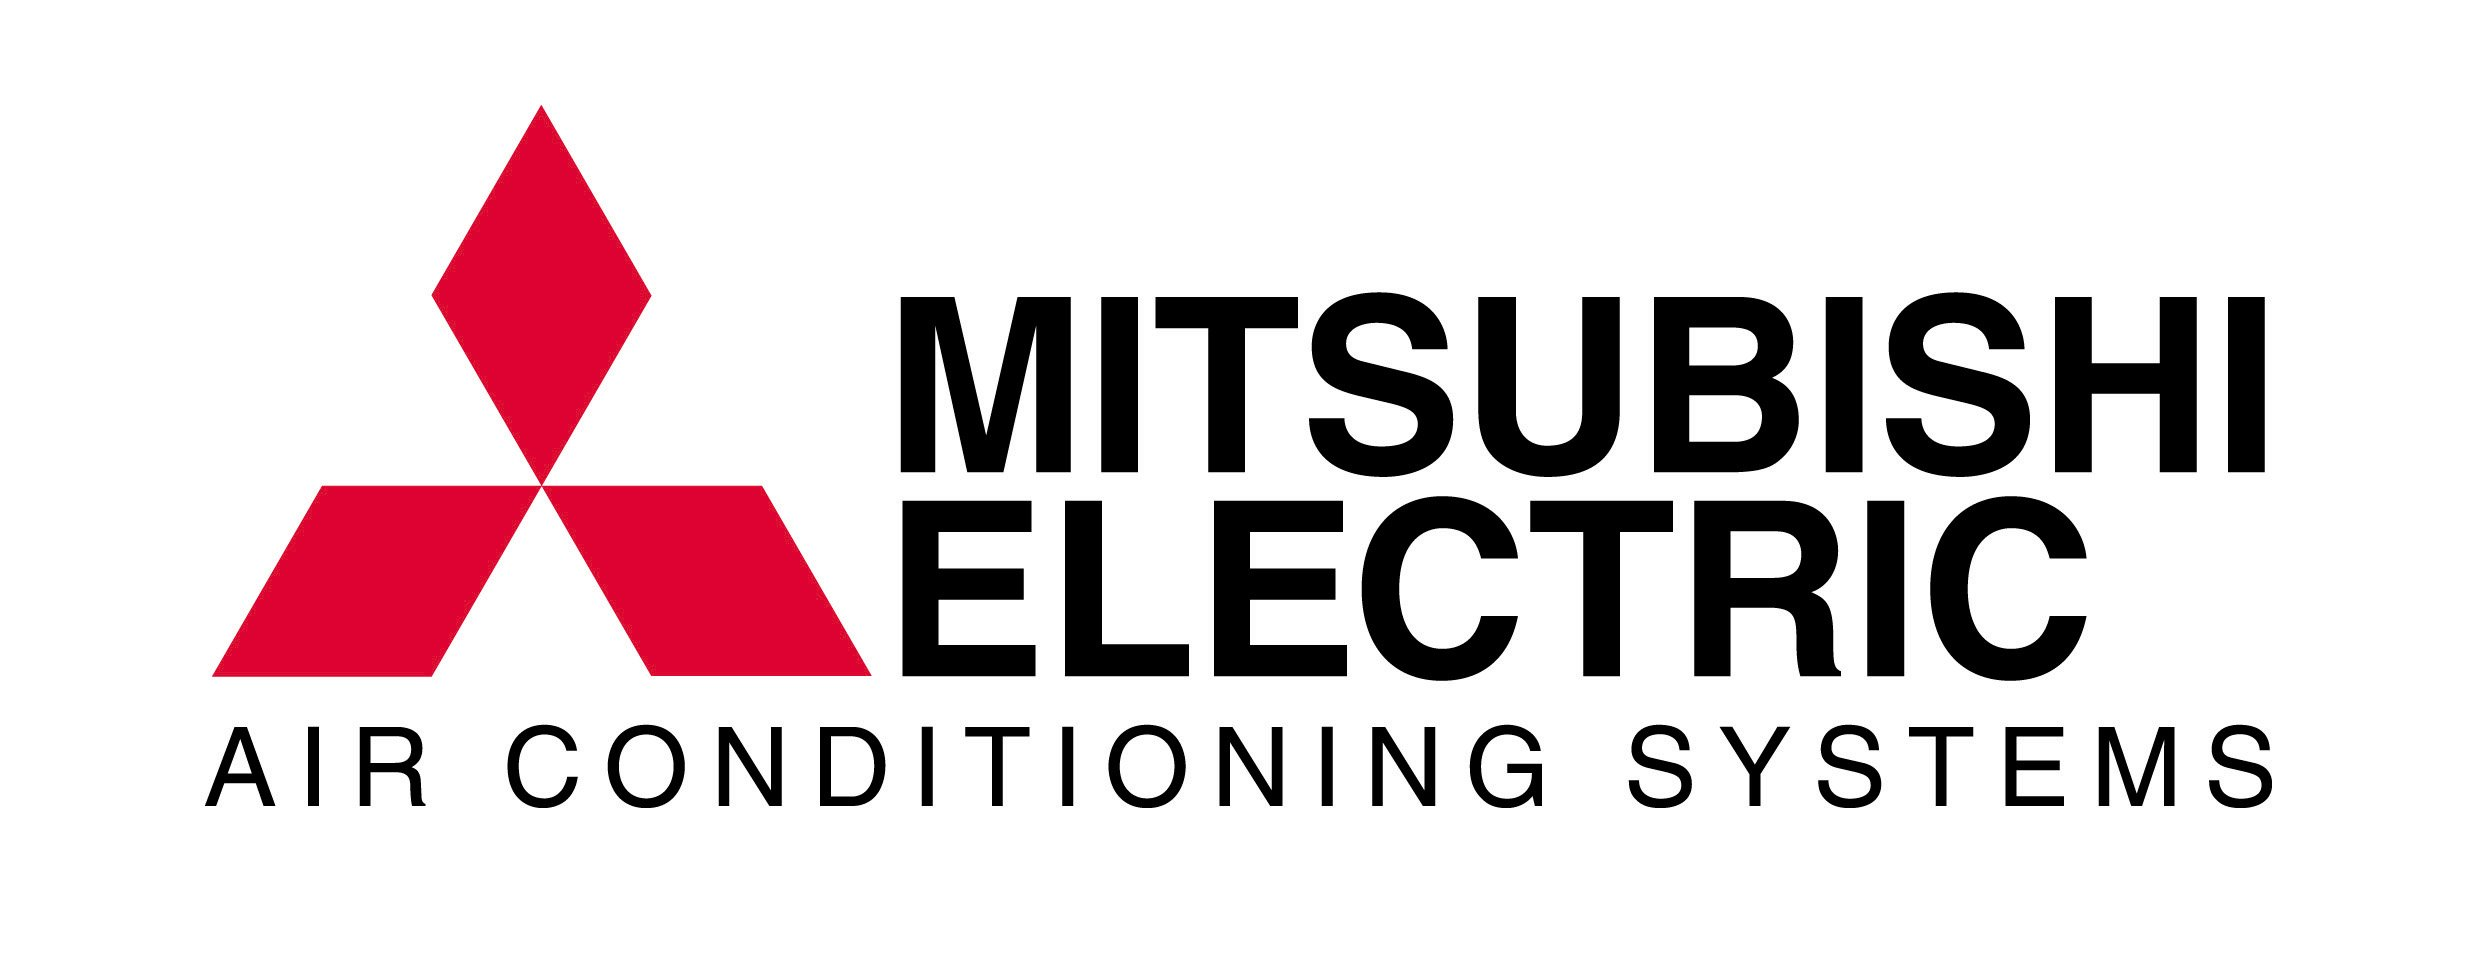 Климатик Mitsubishi electric, цена